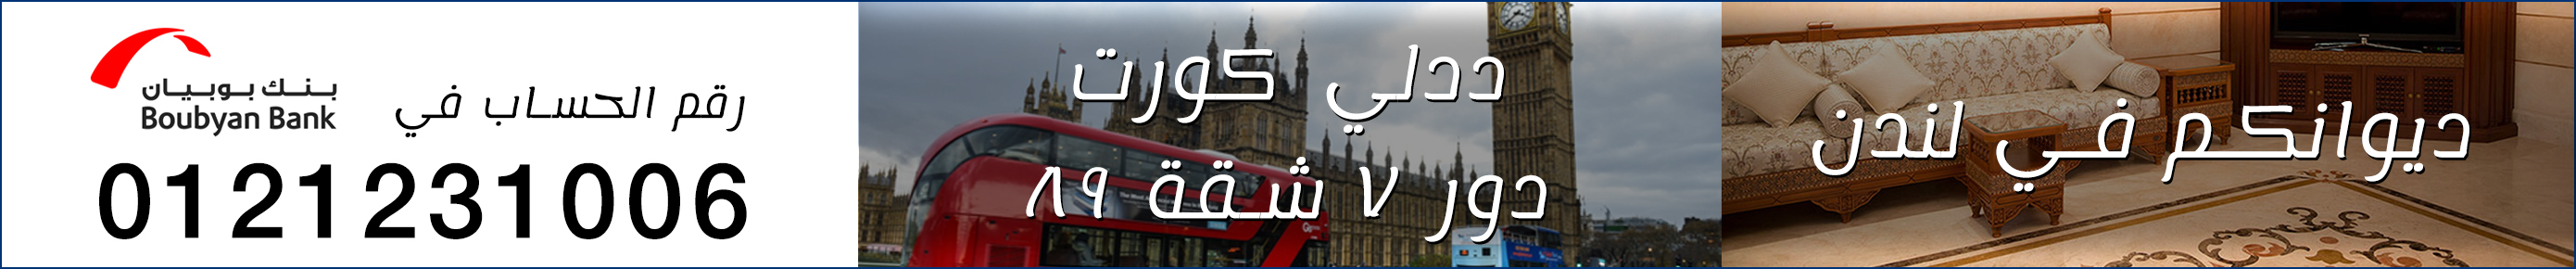 ديوان عتيبه في لندن